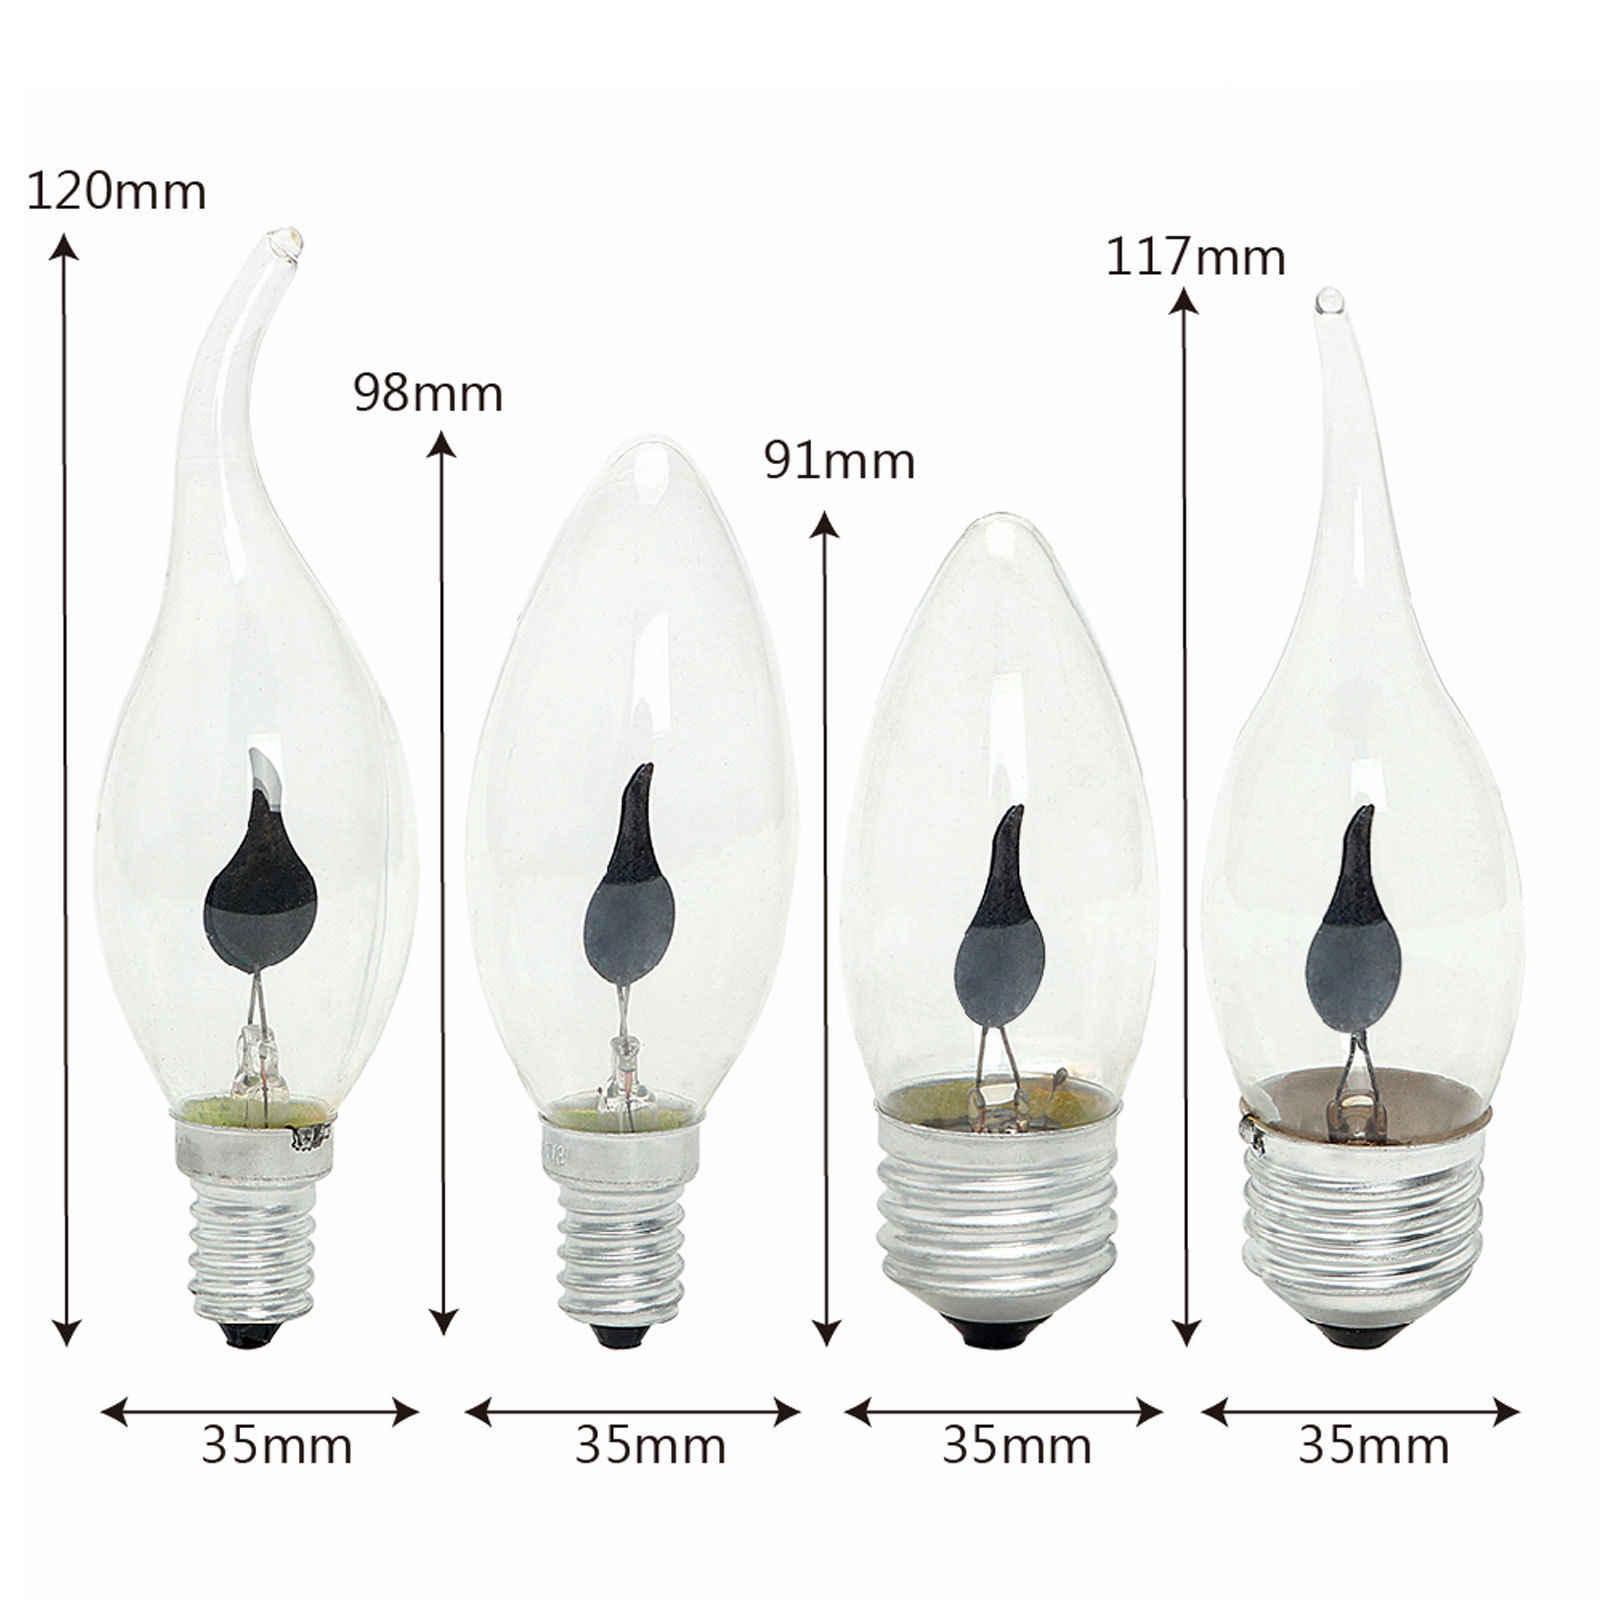 Vela LED de punta de llama, luz parpadeante de fuego natural simulado E14 E27 3W, bombilla de filamento Vintage Bar Pub lámpara de decoración del hogar 220V